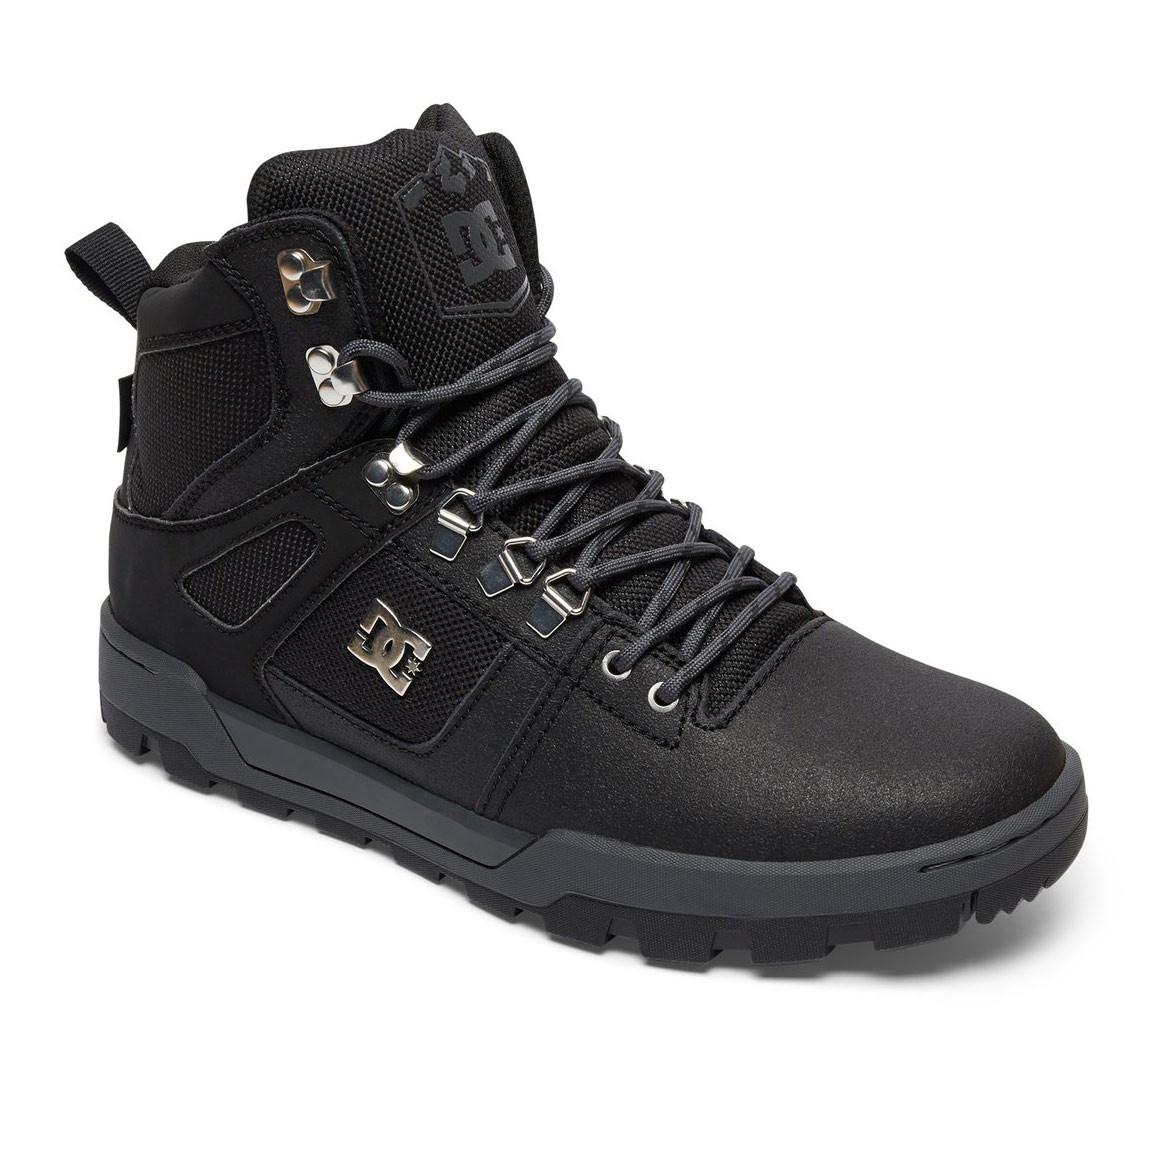 Zimní boty DC Spartan High Wr black/black/dk grey